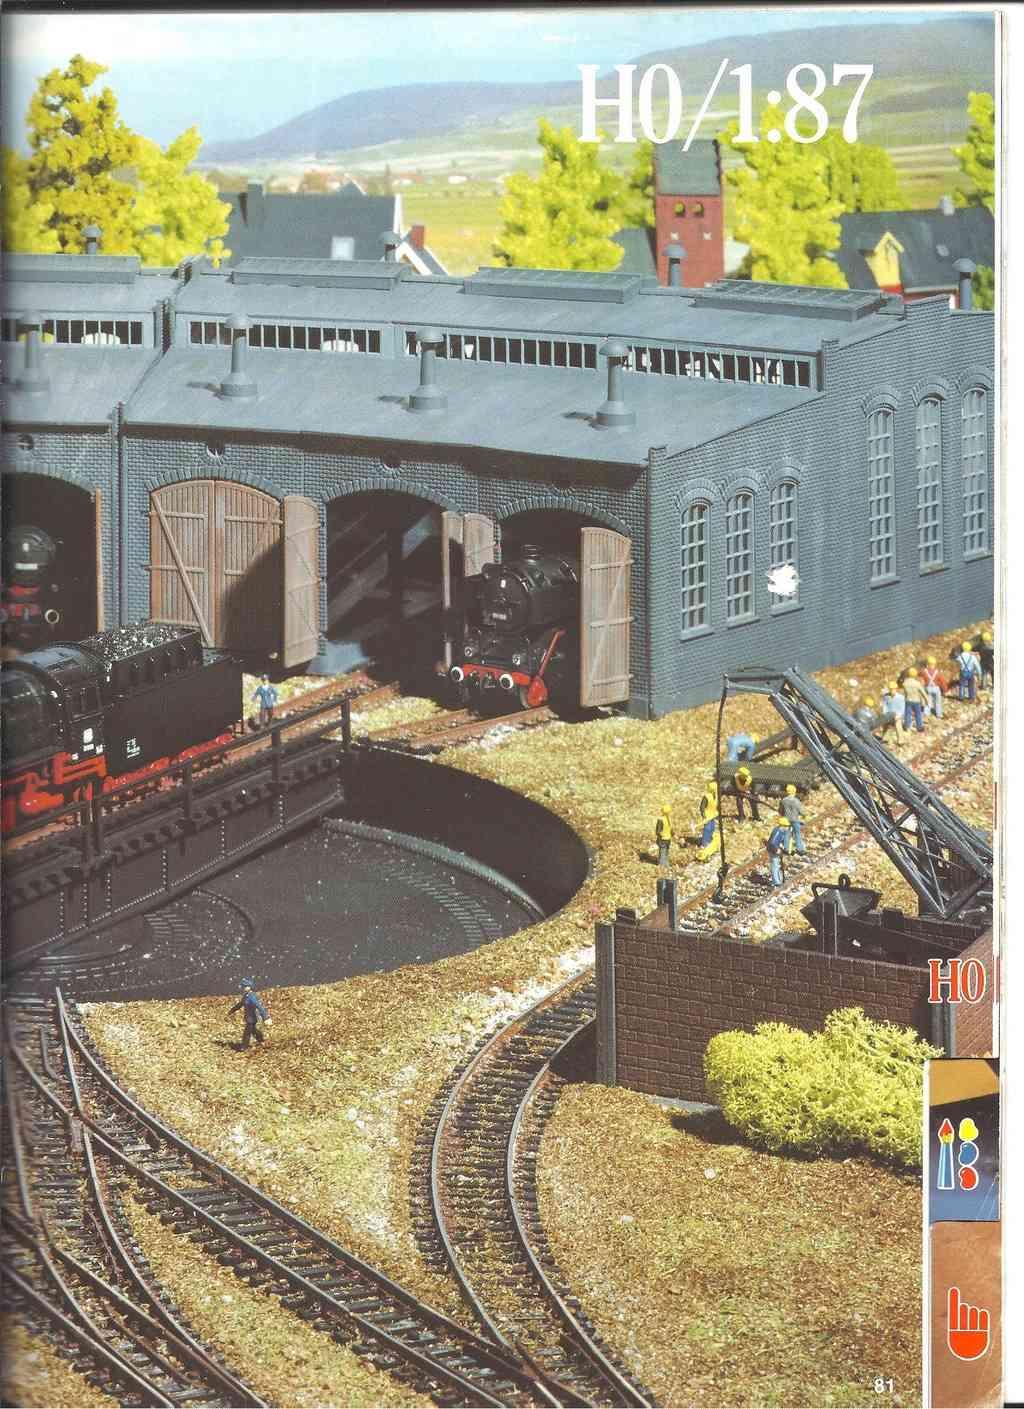 1984 - [REVELL 1984] Catalogue 1984  Revel207